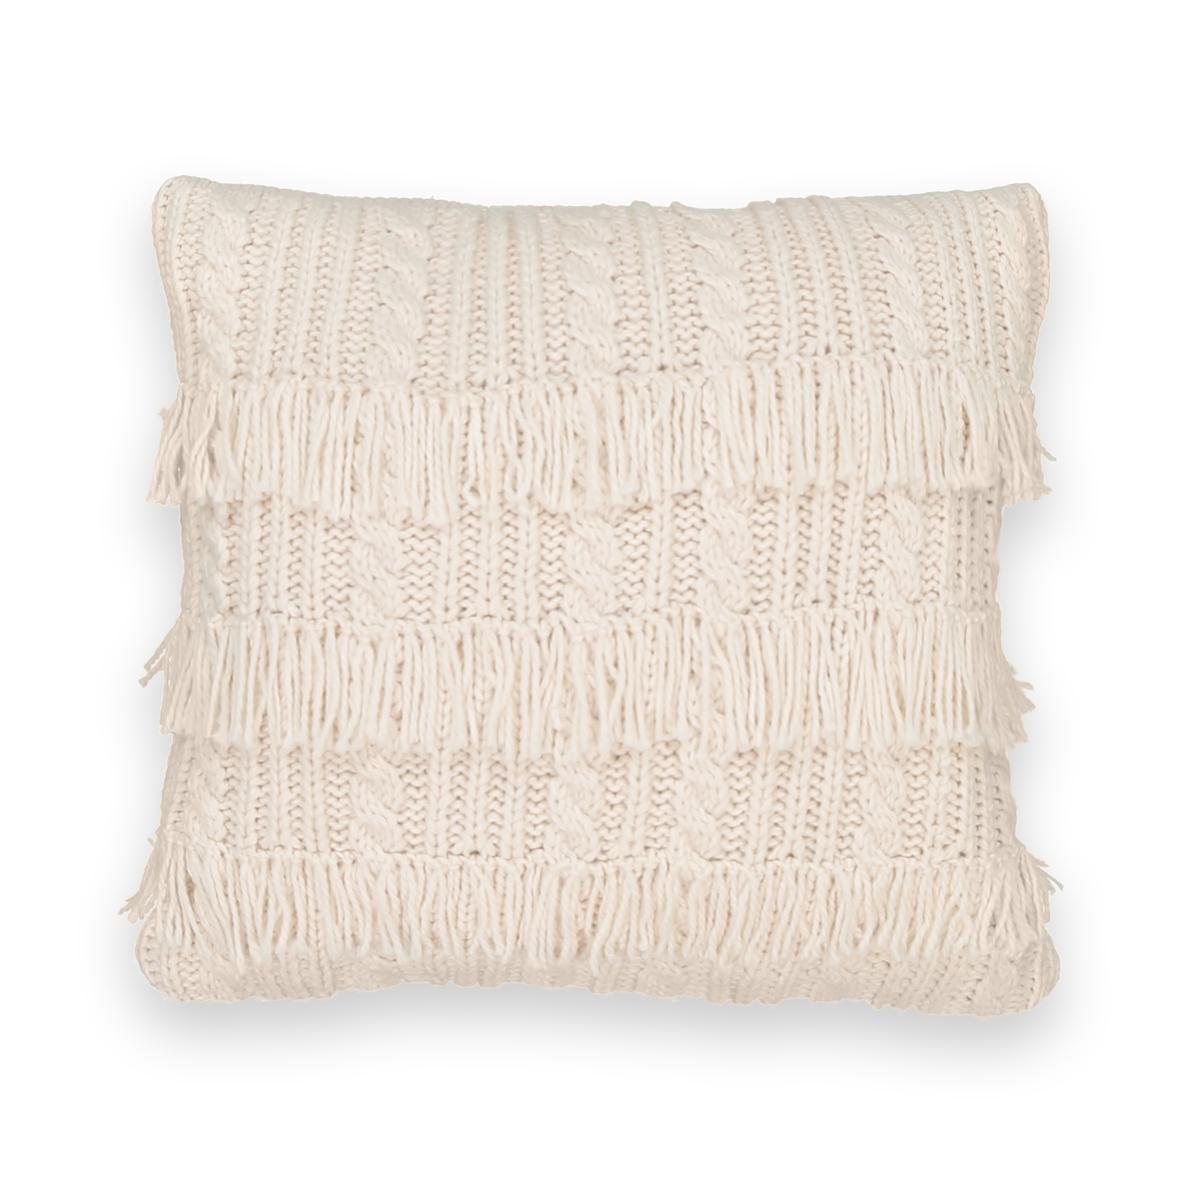 Чехол на подушку трикотажный с бахромой, LOPIK